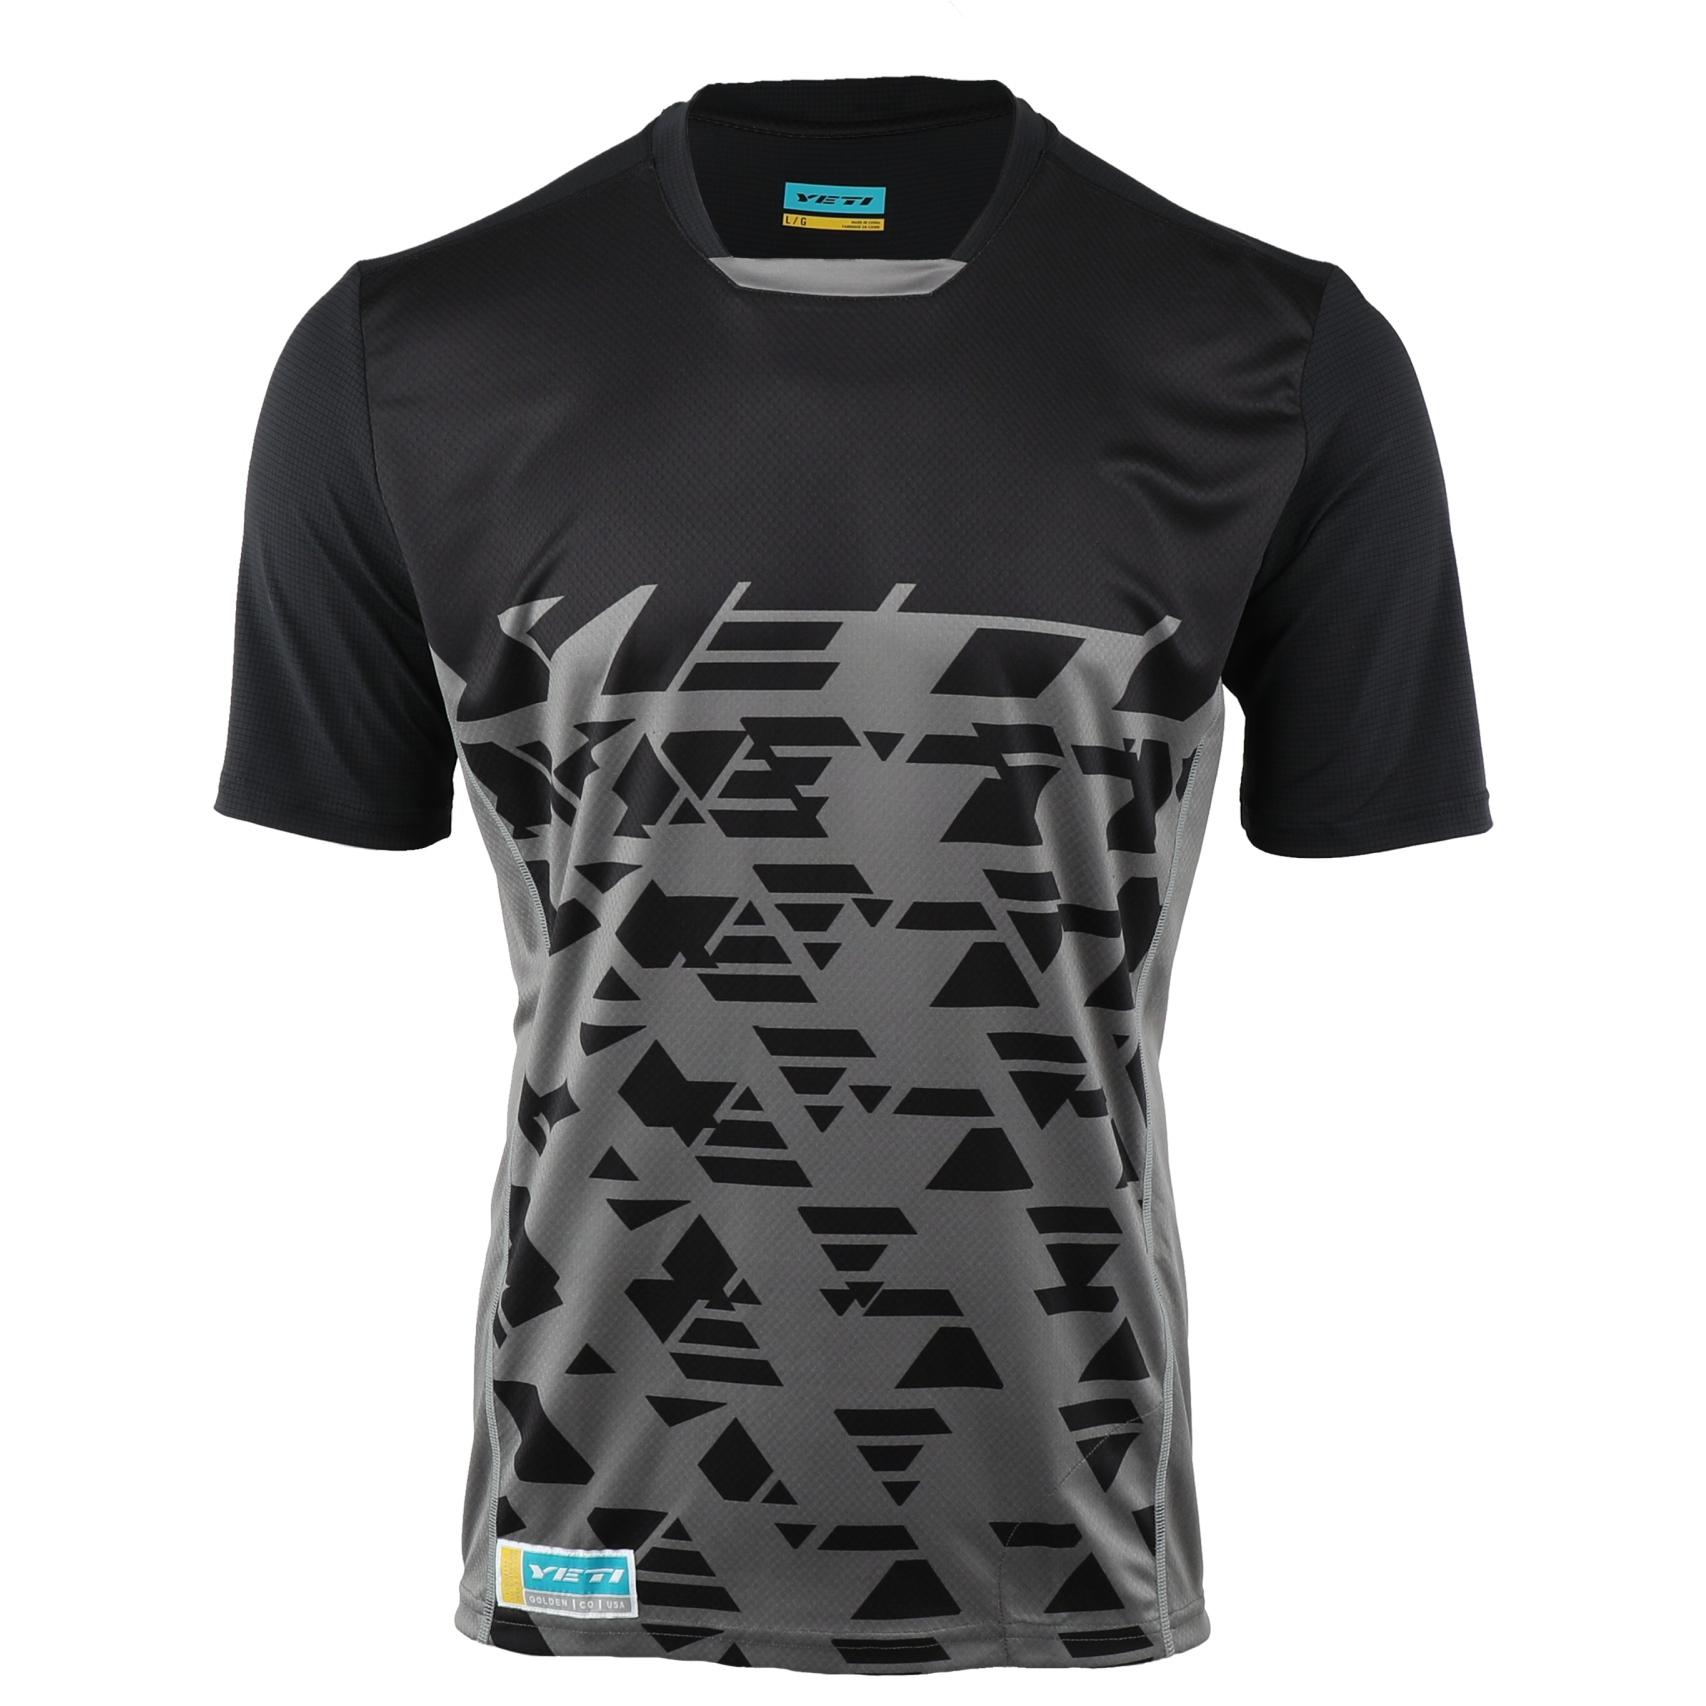 Yeti Cycles Enduro Short Sleeve Jersey - Black